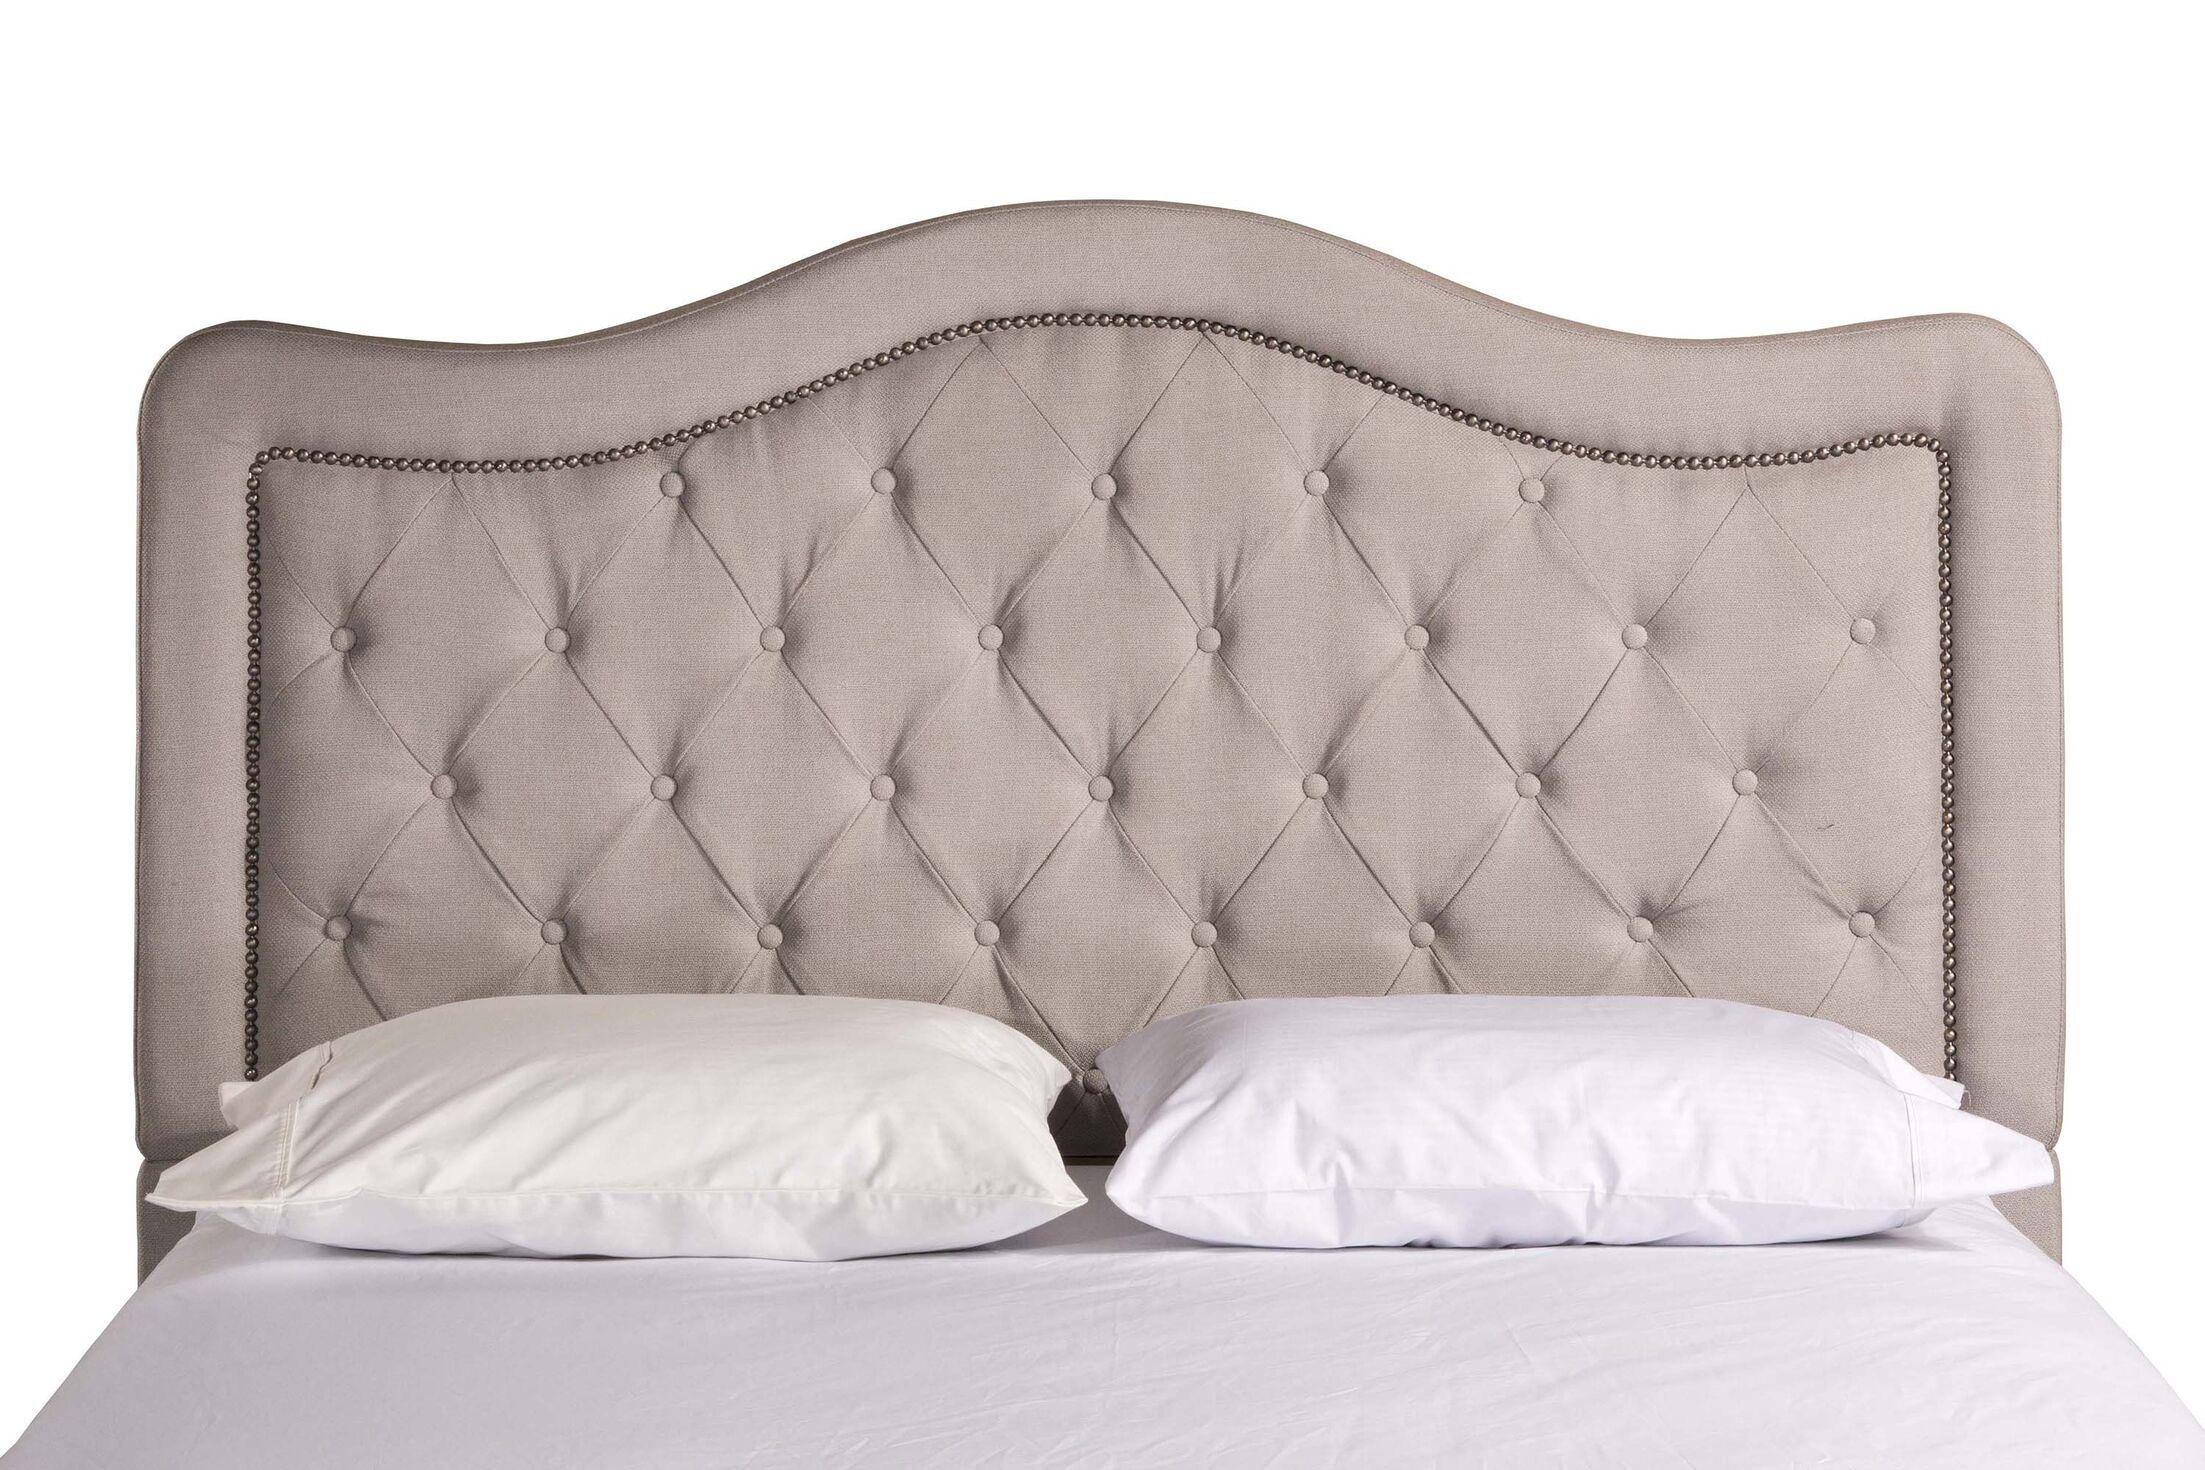 Broxburne Upholstered Panel Headboard Upholstery: Dove Gray, Size: California King